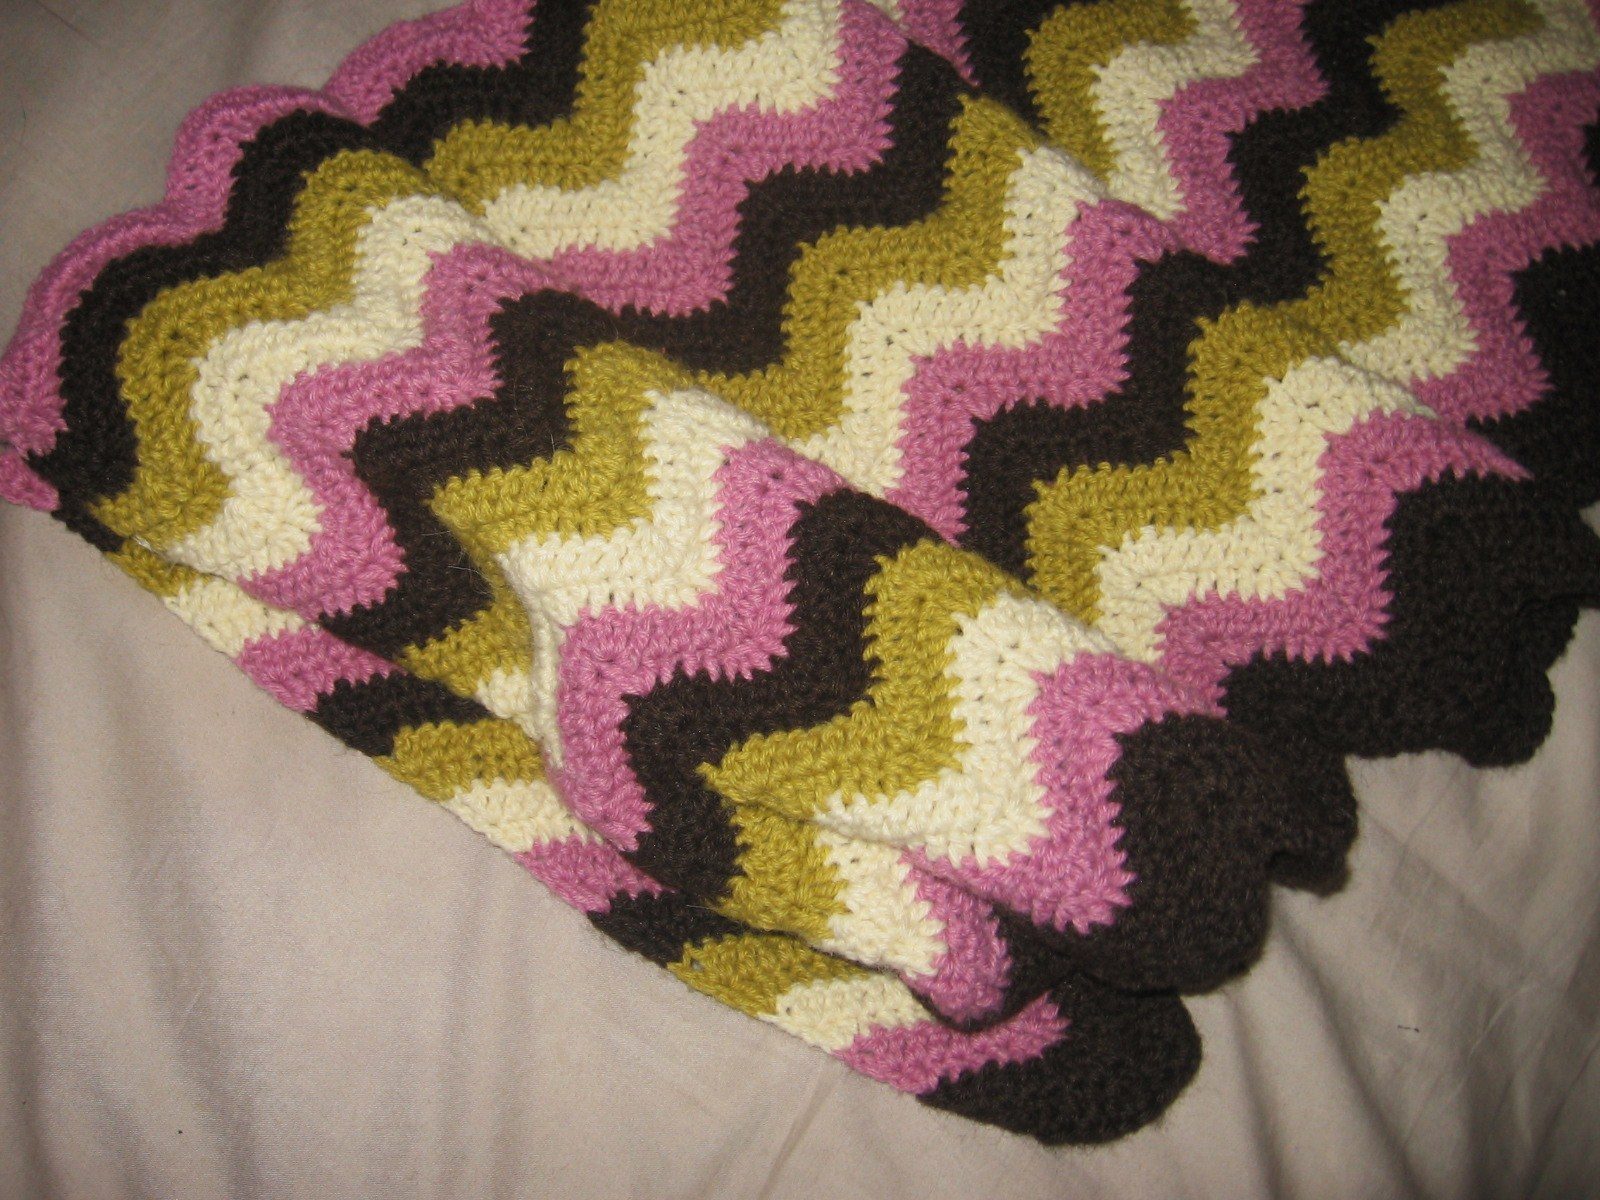 Asombroso Crochet Modelo De Zigzag Ideas - Patrón de Vestido de ...